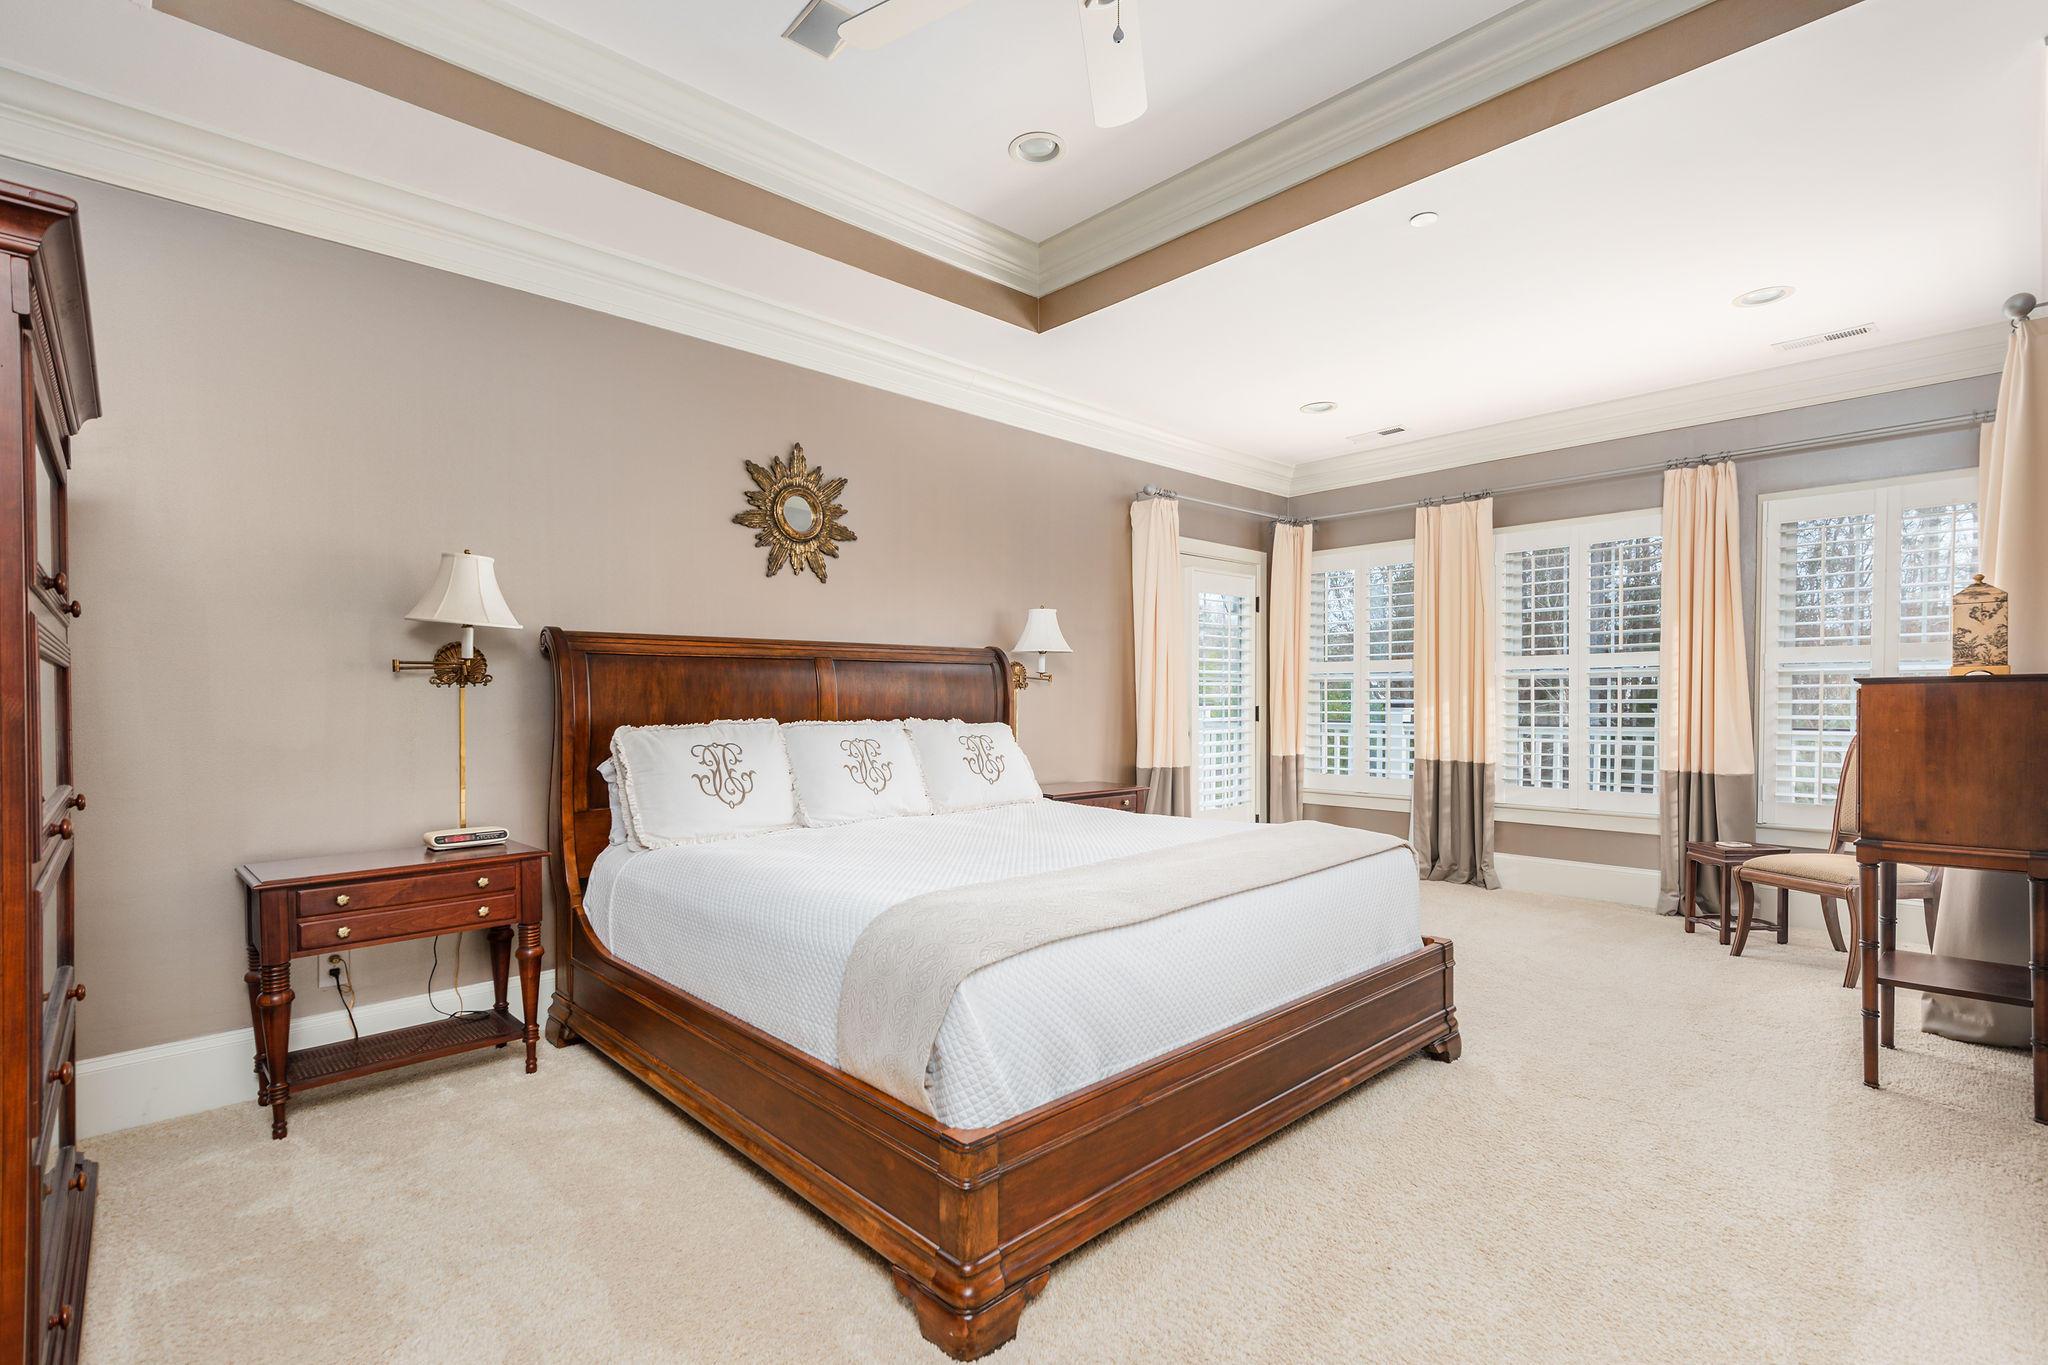 Dunes West Homes For Sale - 1305 King Bird, Mount Pleasant, SC - 26